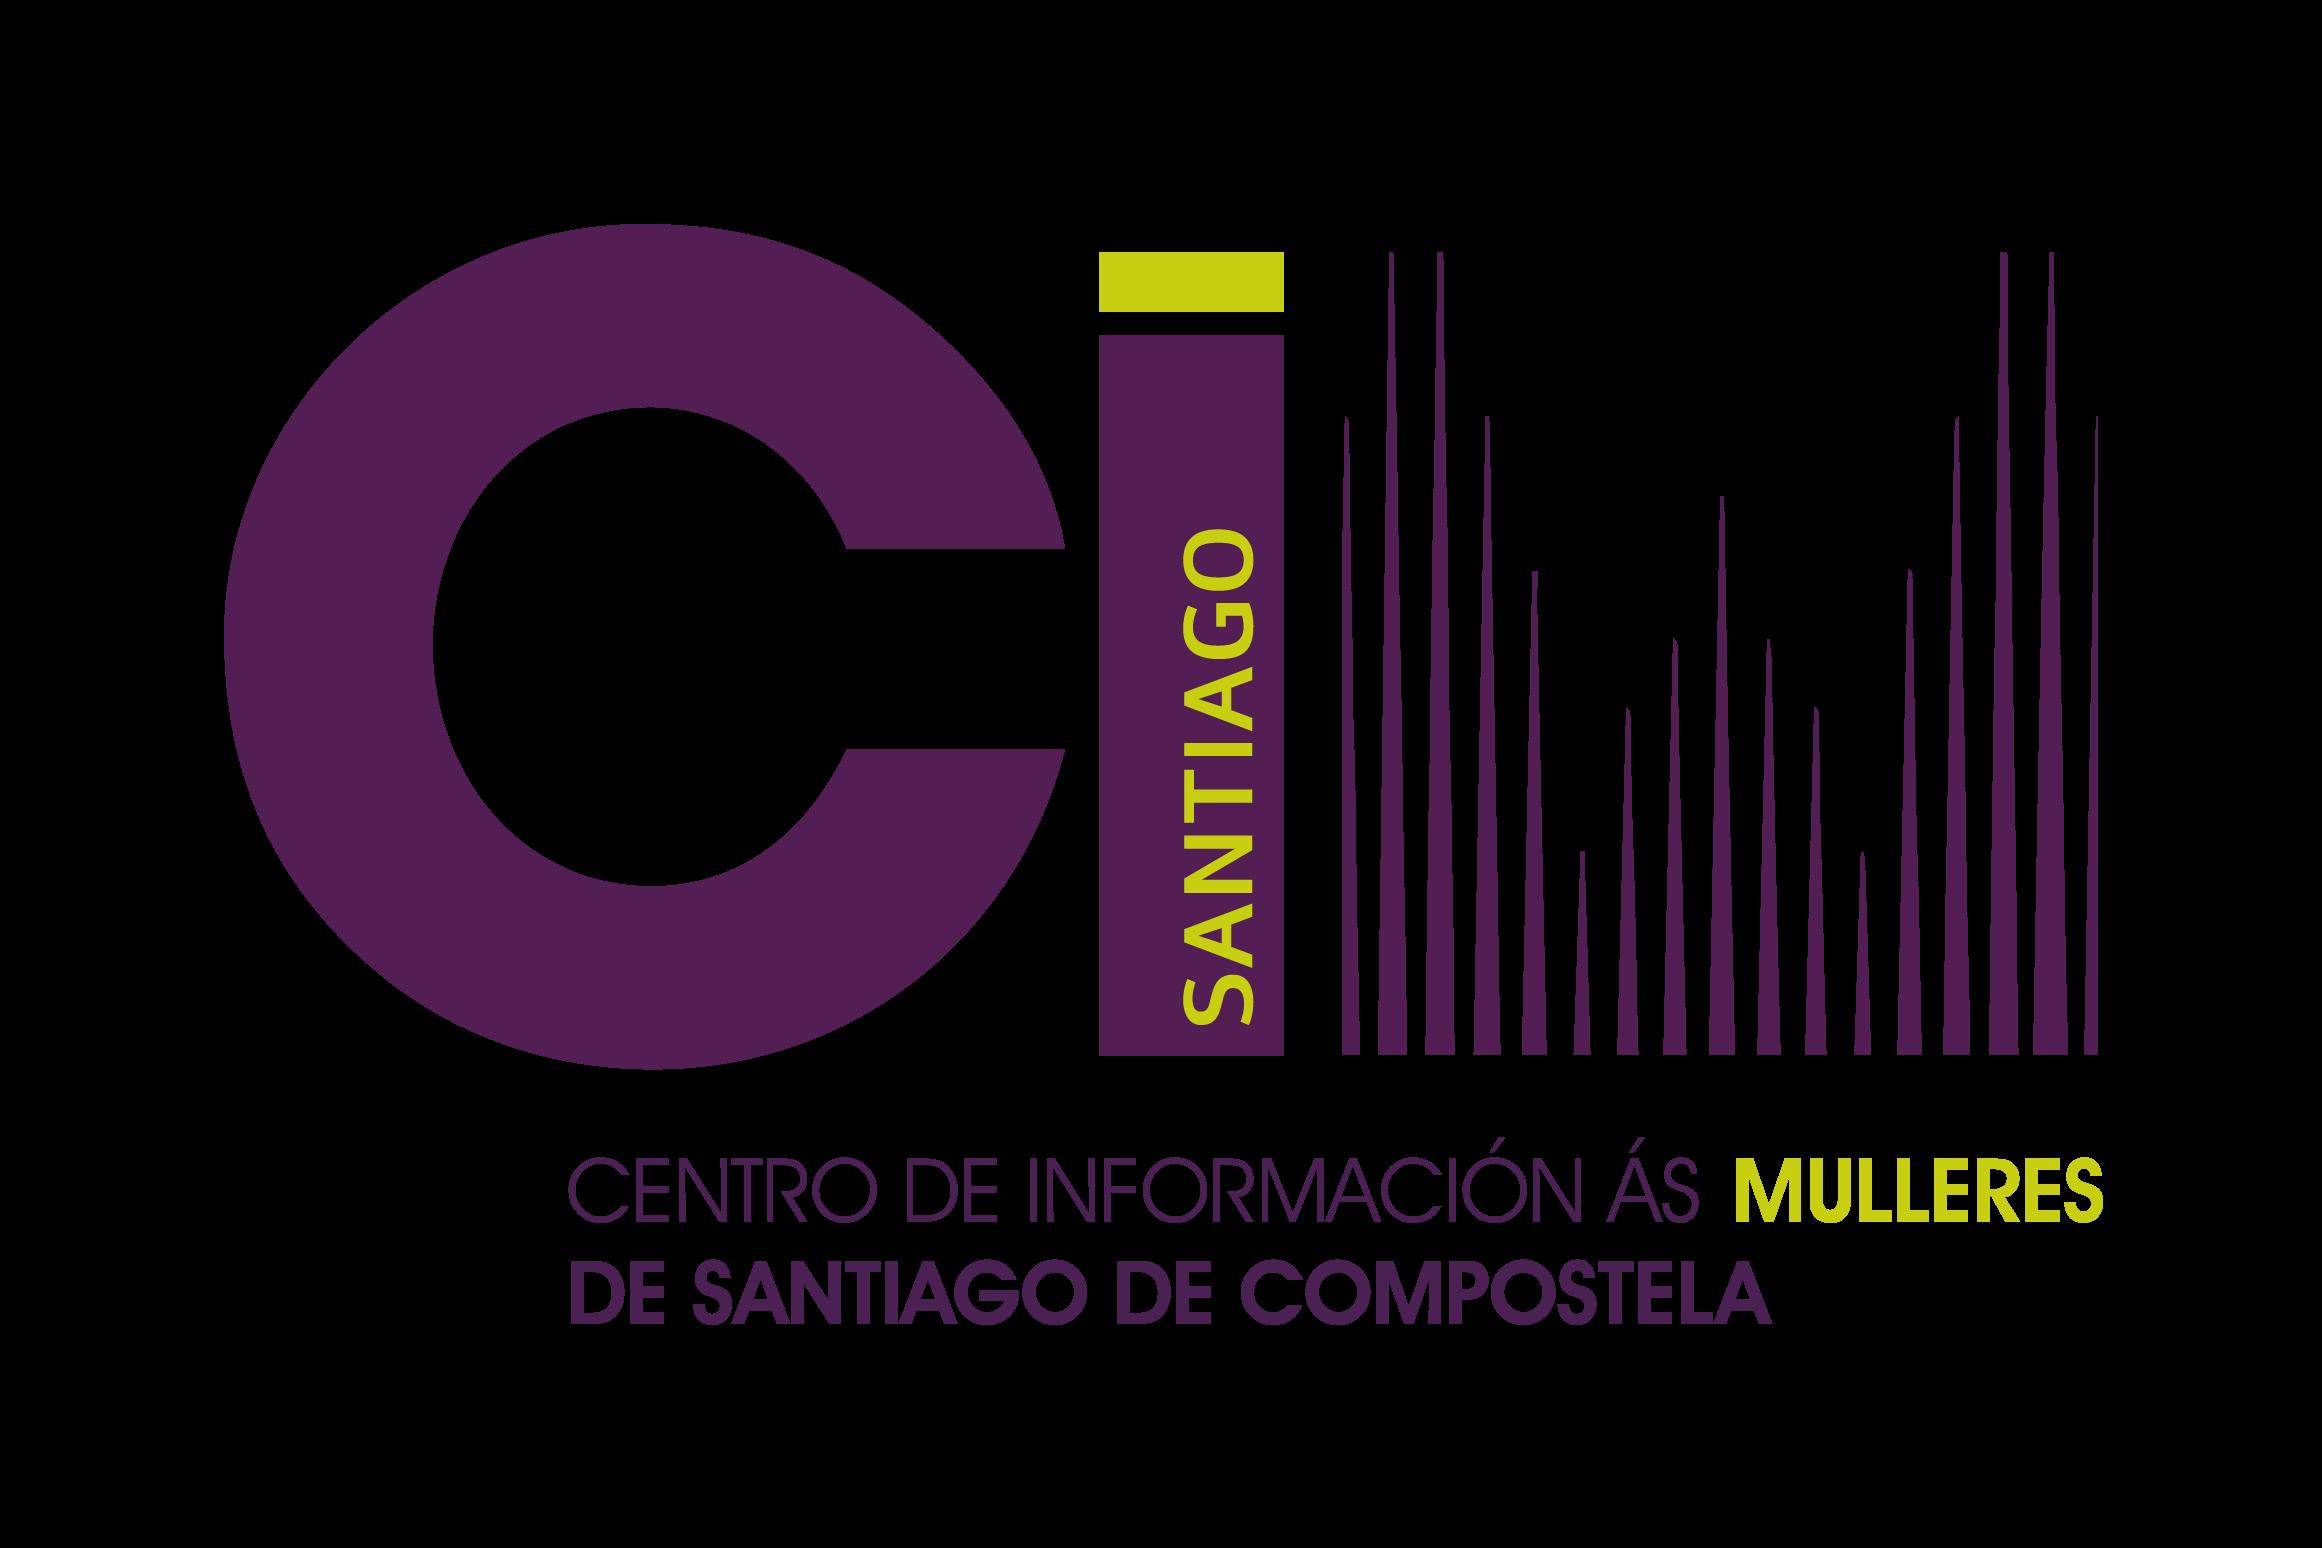 Cim Compostela